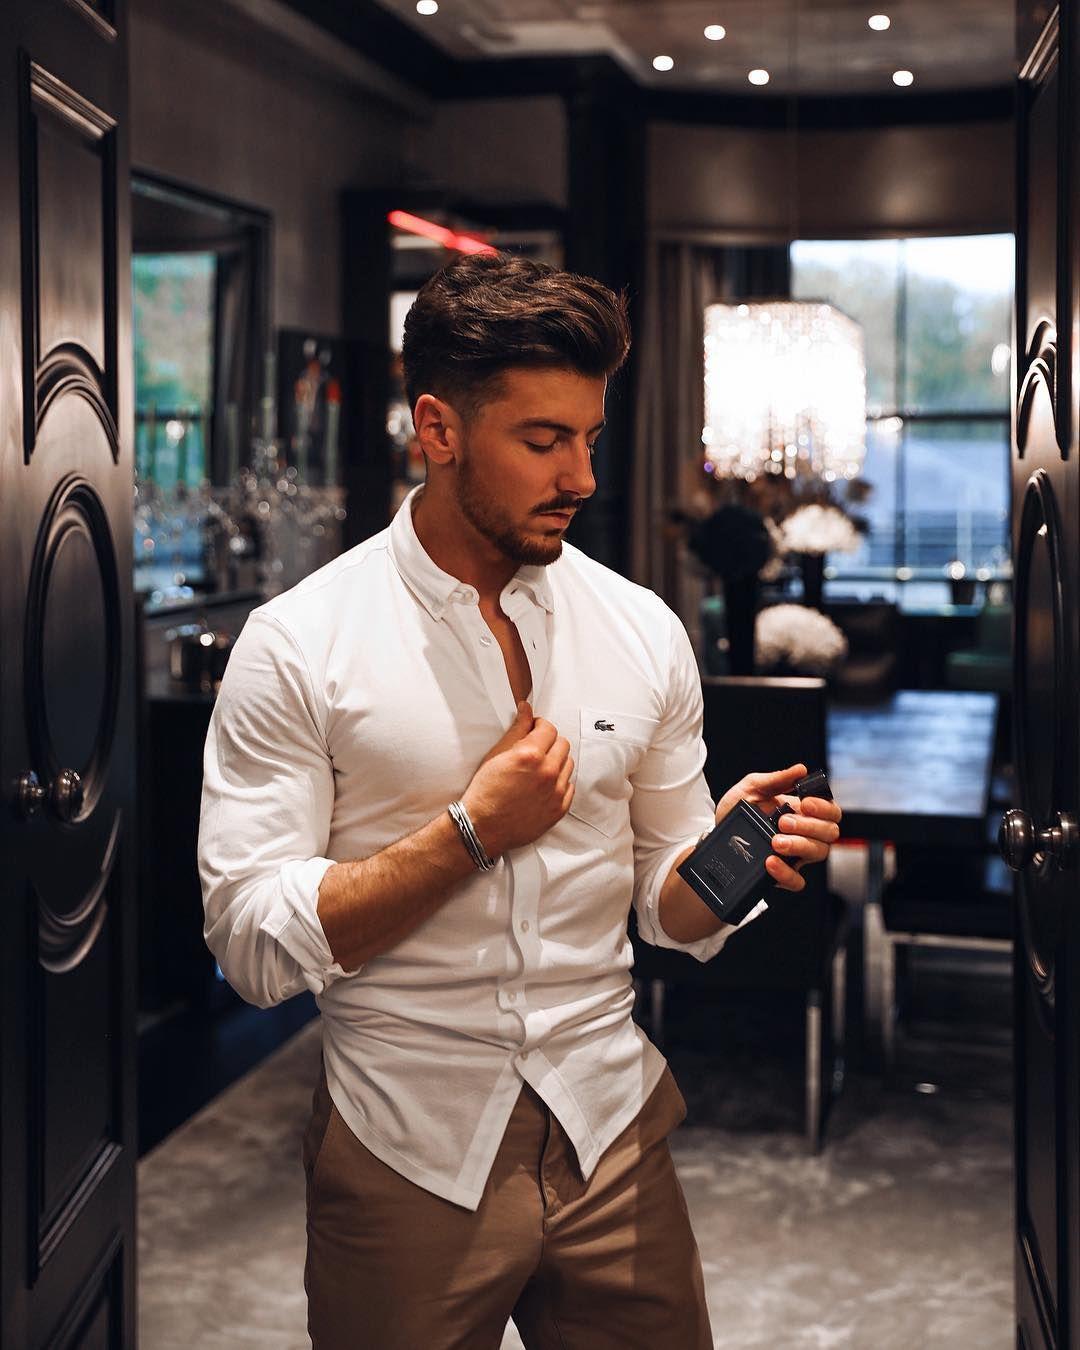 Oxford Men Blue Plain Formal Dress Shirt Men Shirt Style White Shirt Men Mens Fashion Summer Shorts [ 1350 x 1080 Pixel ]